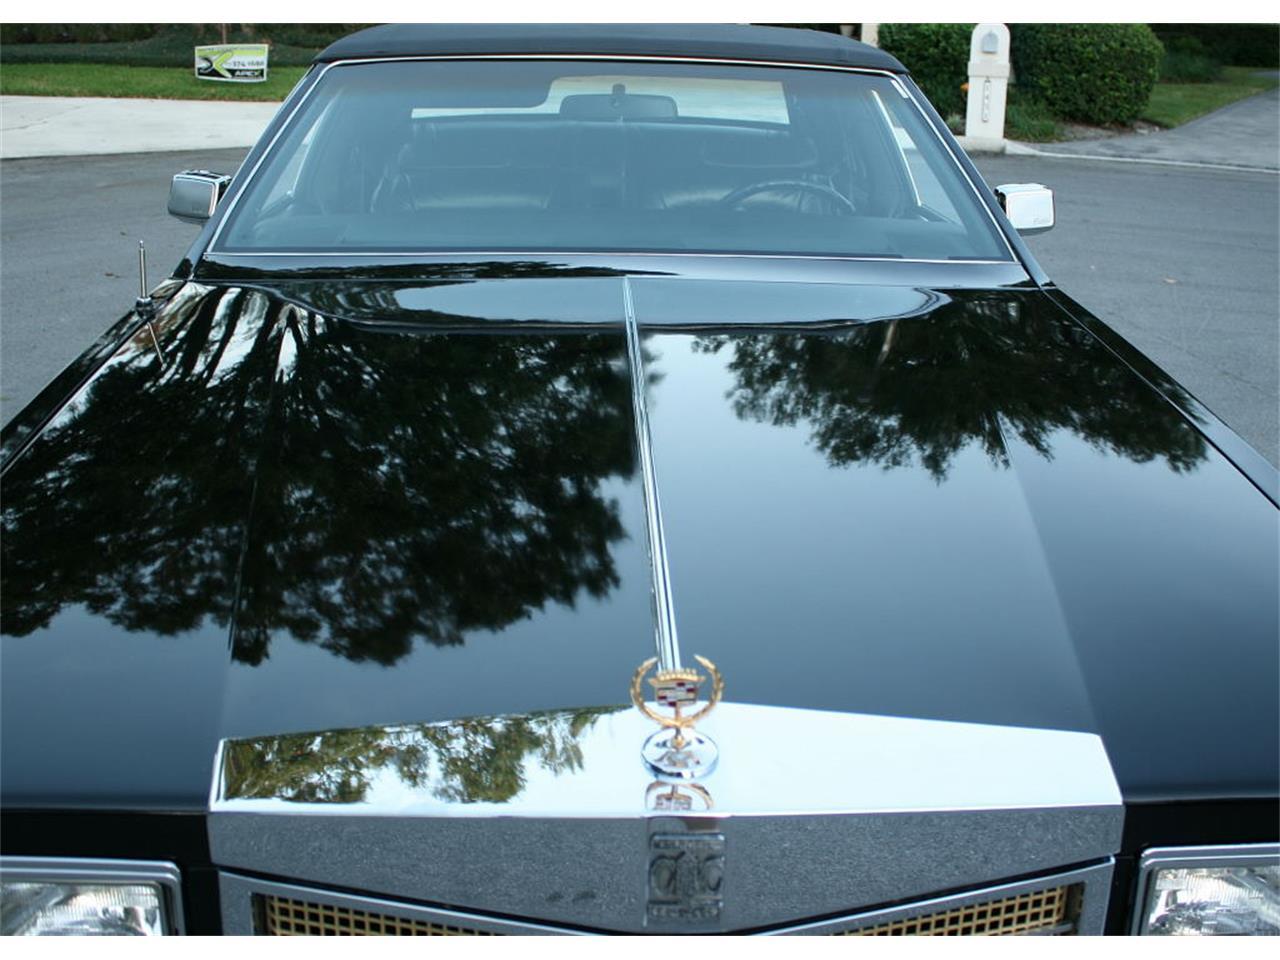 1983 Cadillac Seville for Sale | ClassicCars.com | CC-1050548